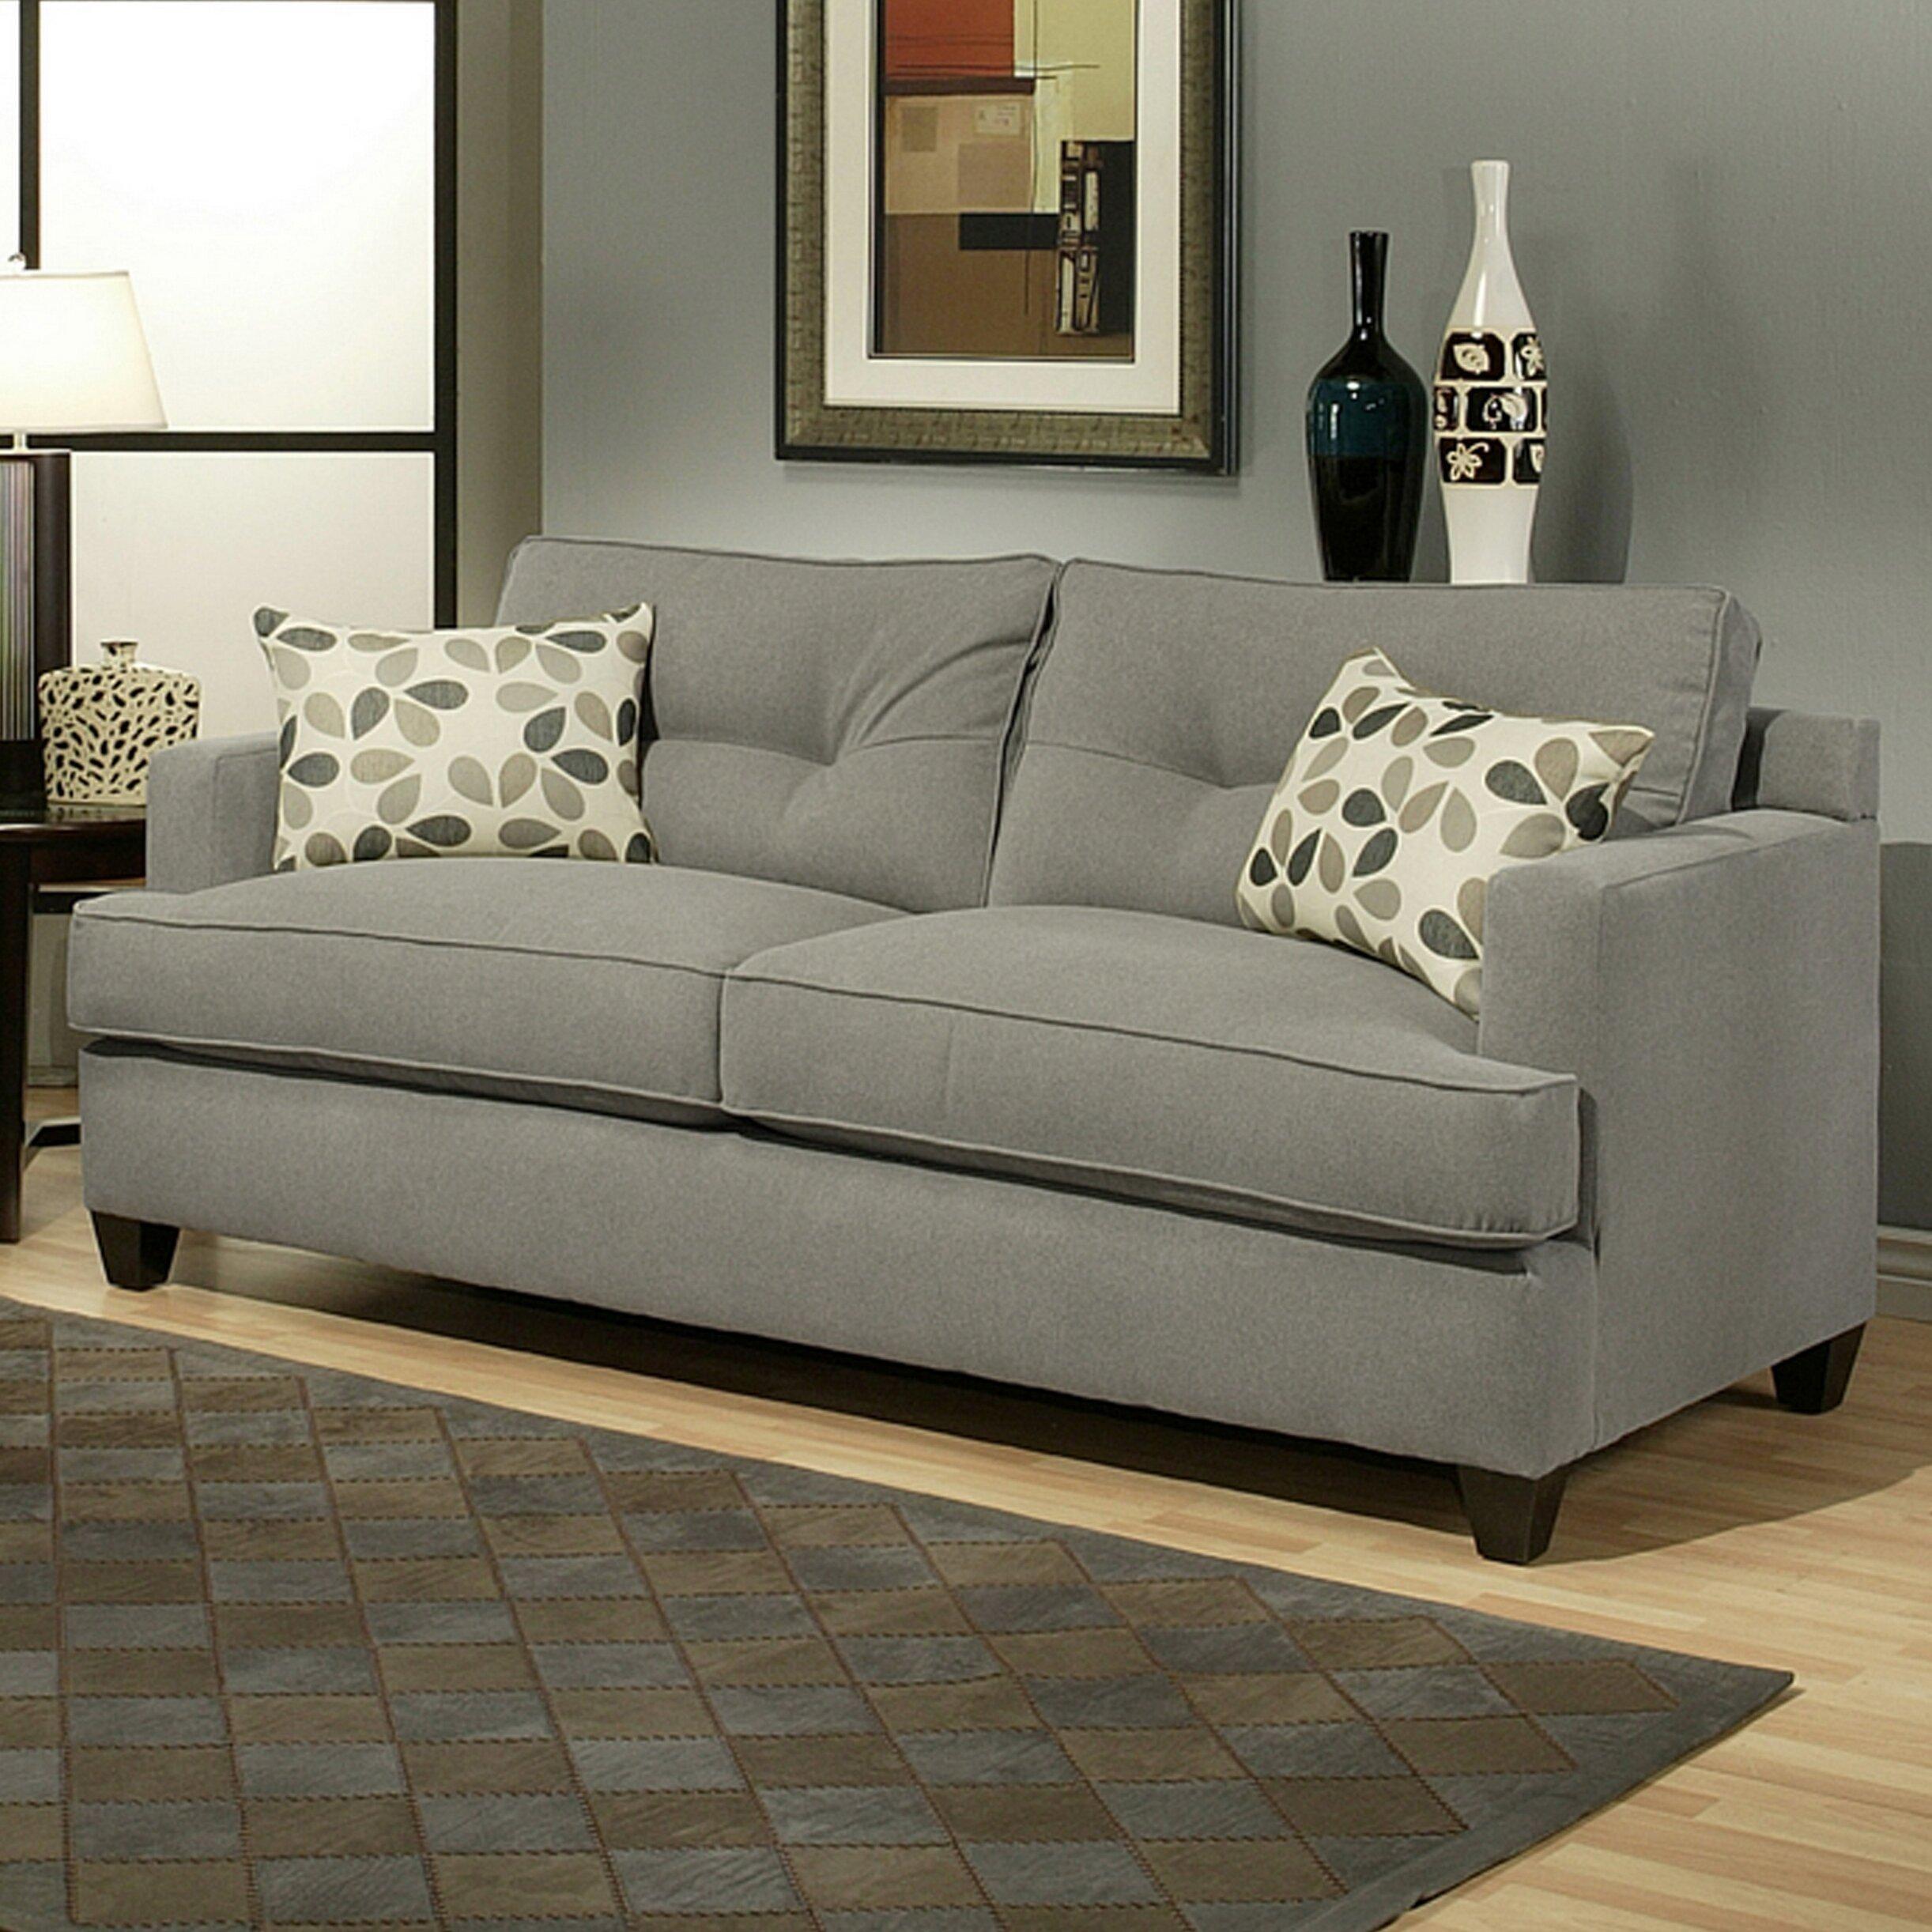 Hokku designs dawn living room collection reviews wayfair for Hokku designs living room furniture